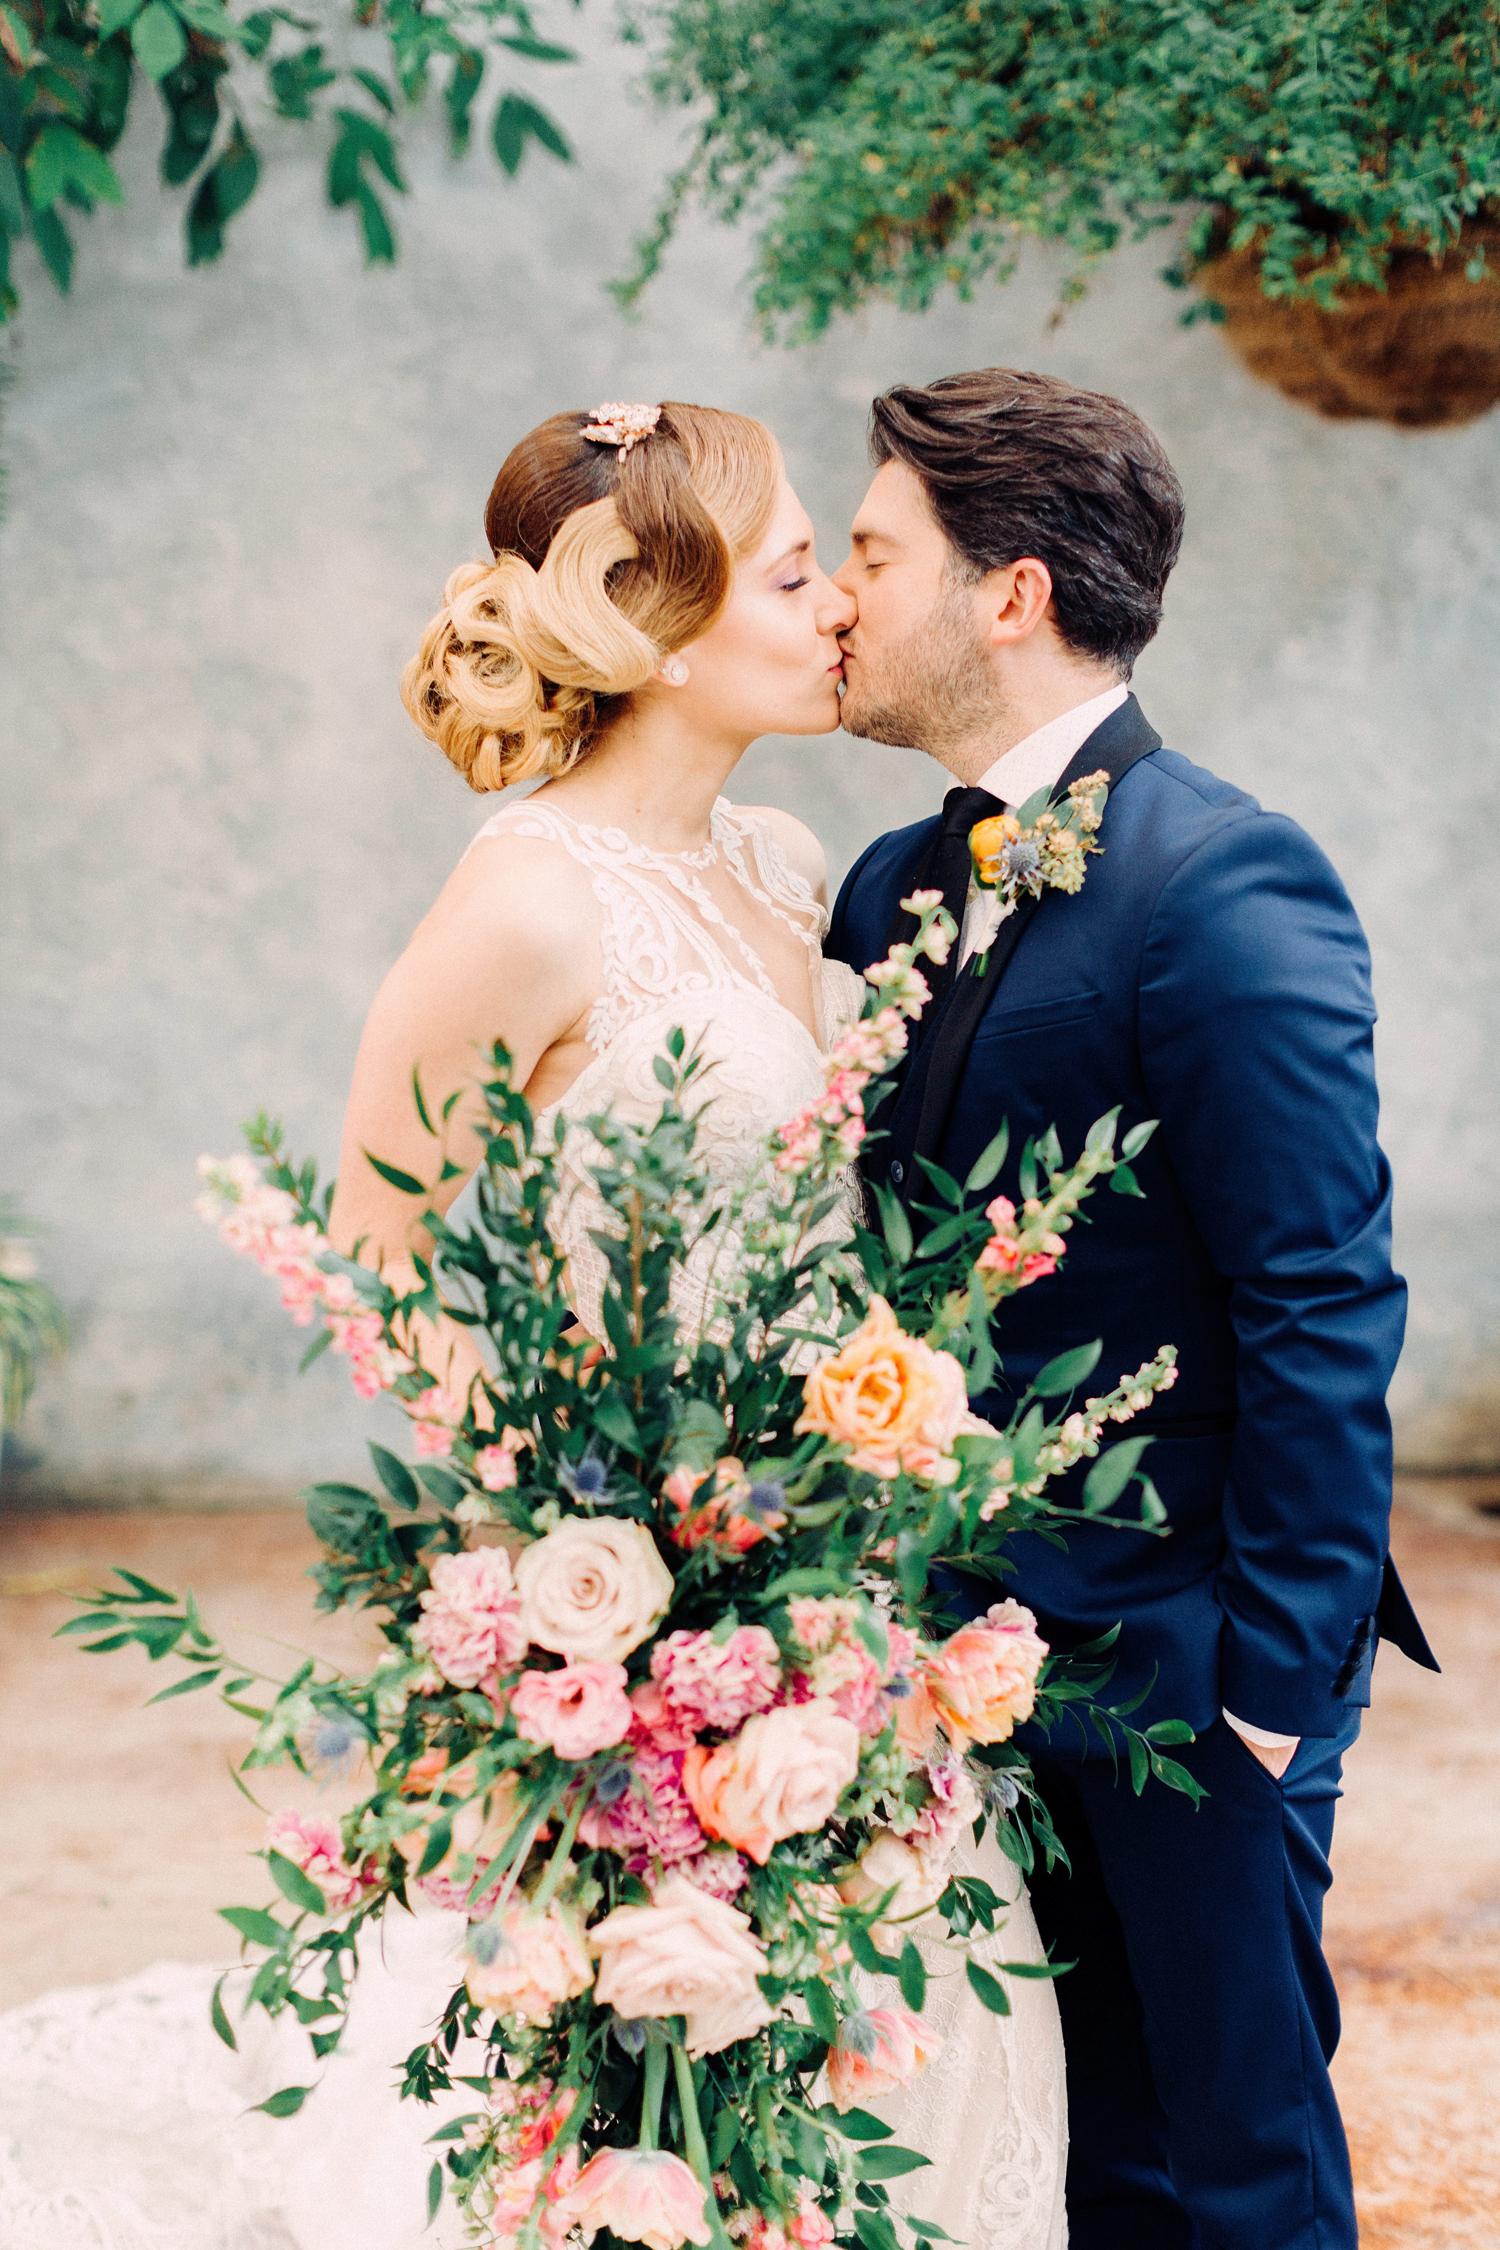 045-alaamarzouk-alaamarzoukphotography-mcallenweddingphotographer-alaa-marzouk-mcallen-mission-wedding-texas-venue-photography-wedding-california-bride-bridal-engagement-austin-elopement.jpg